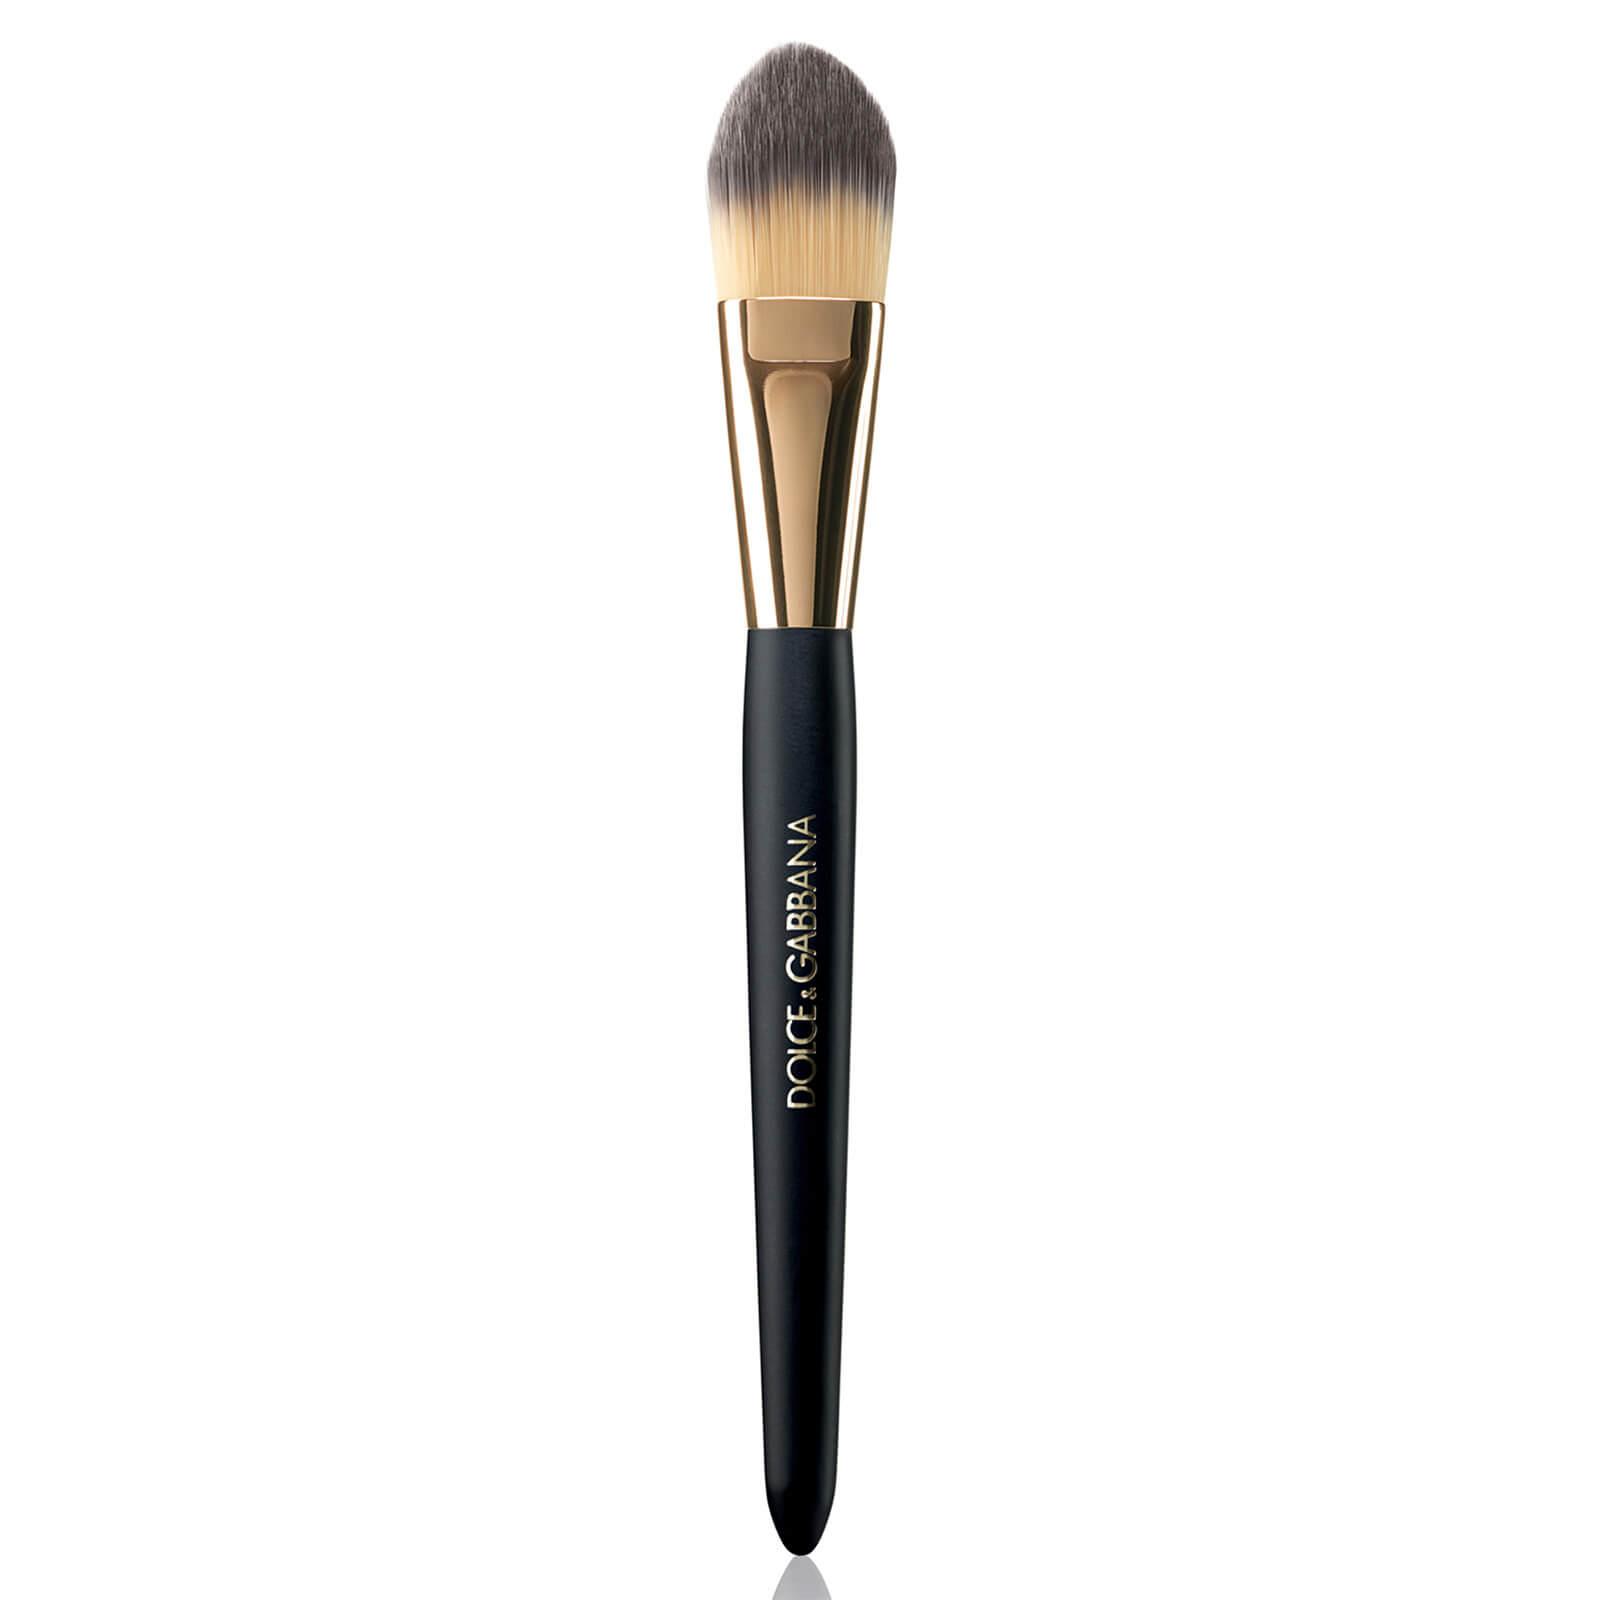 Dolce&Gabbana Foundation Brush